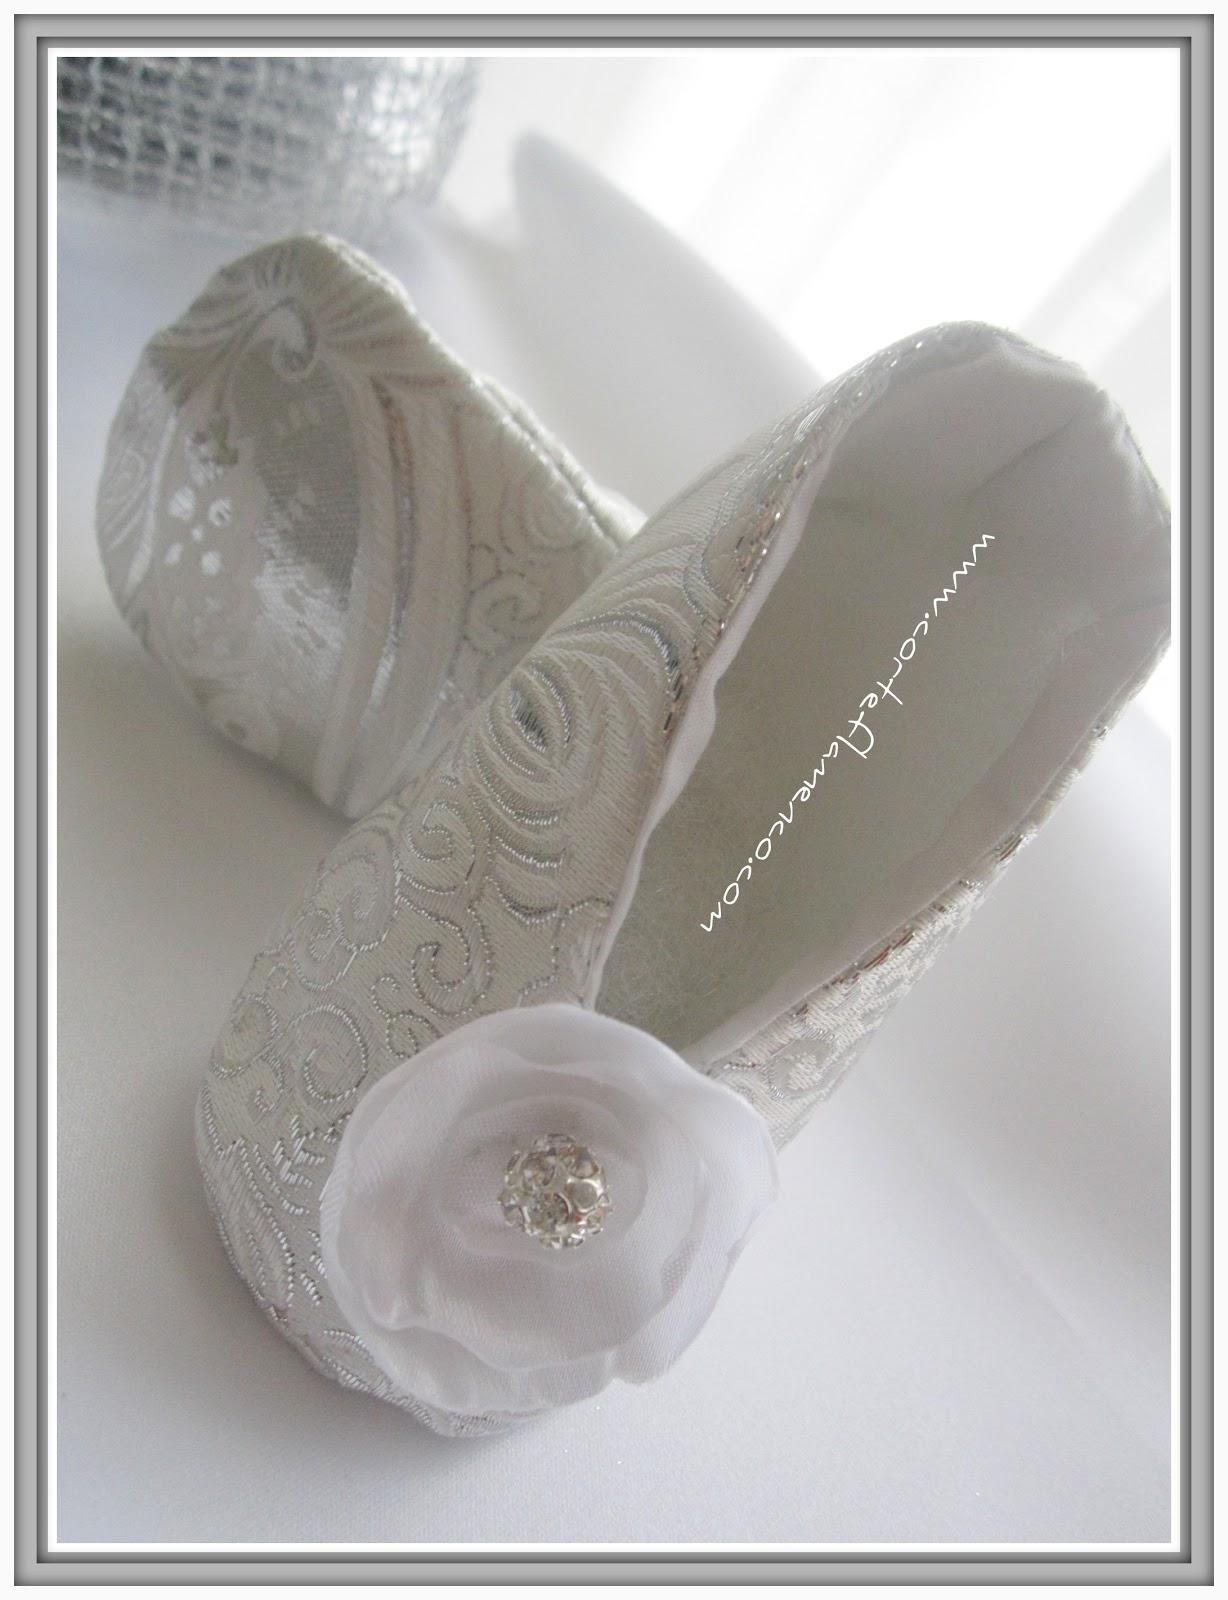 imagenes de zapatos para niños - fotos zapatos | Zapatos para Niña Coppel